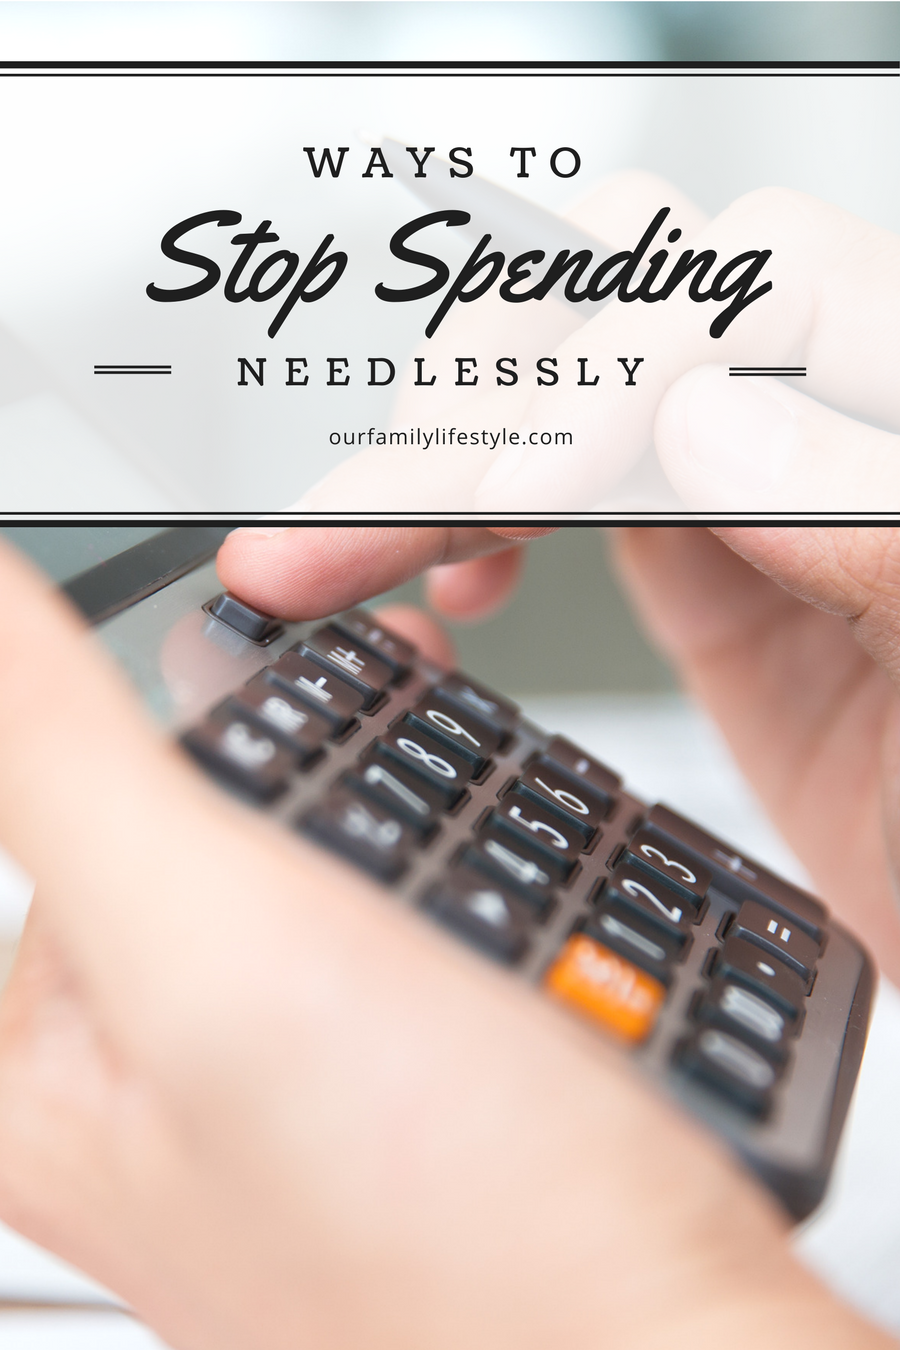 Ways to Stop Spending Needlessly